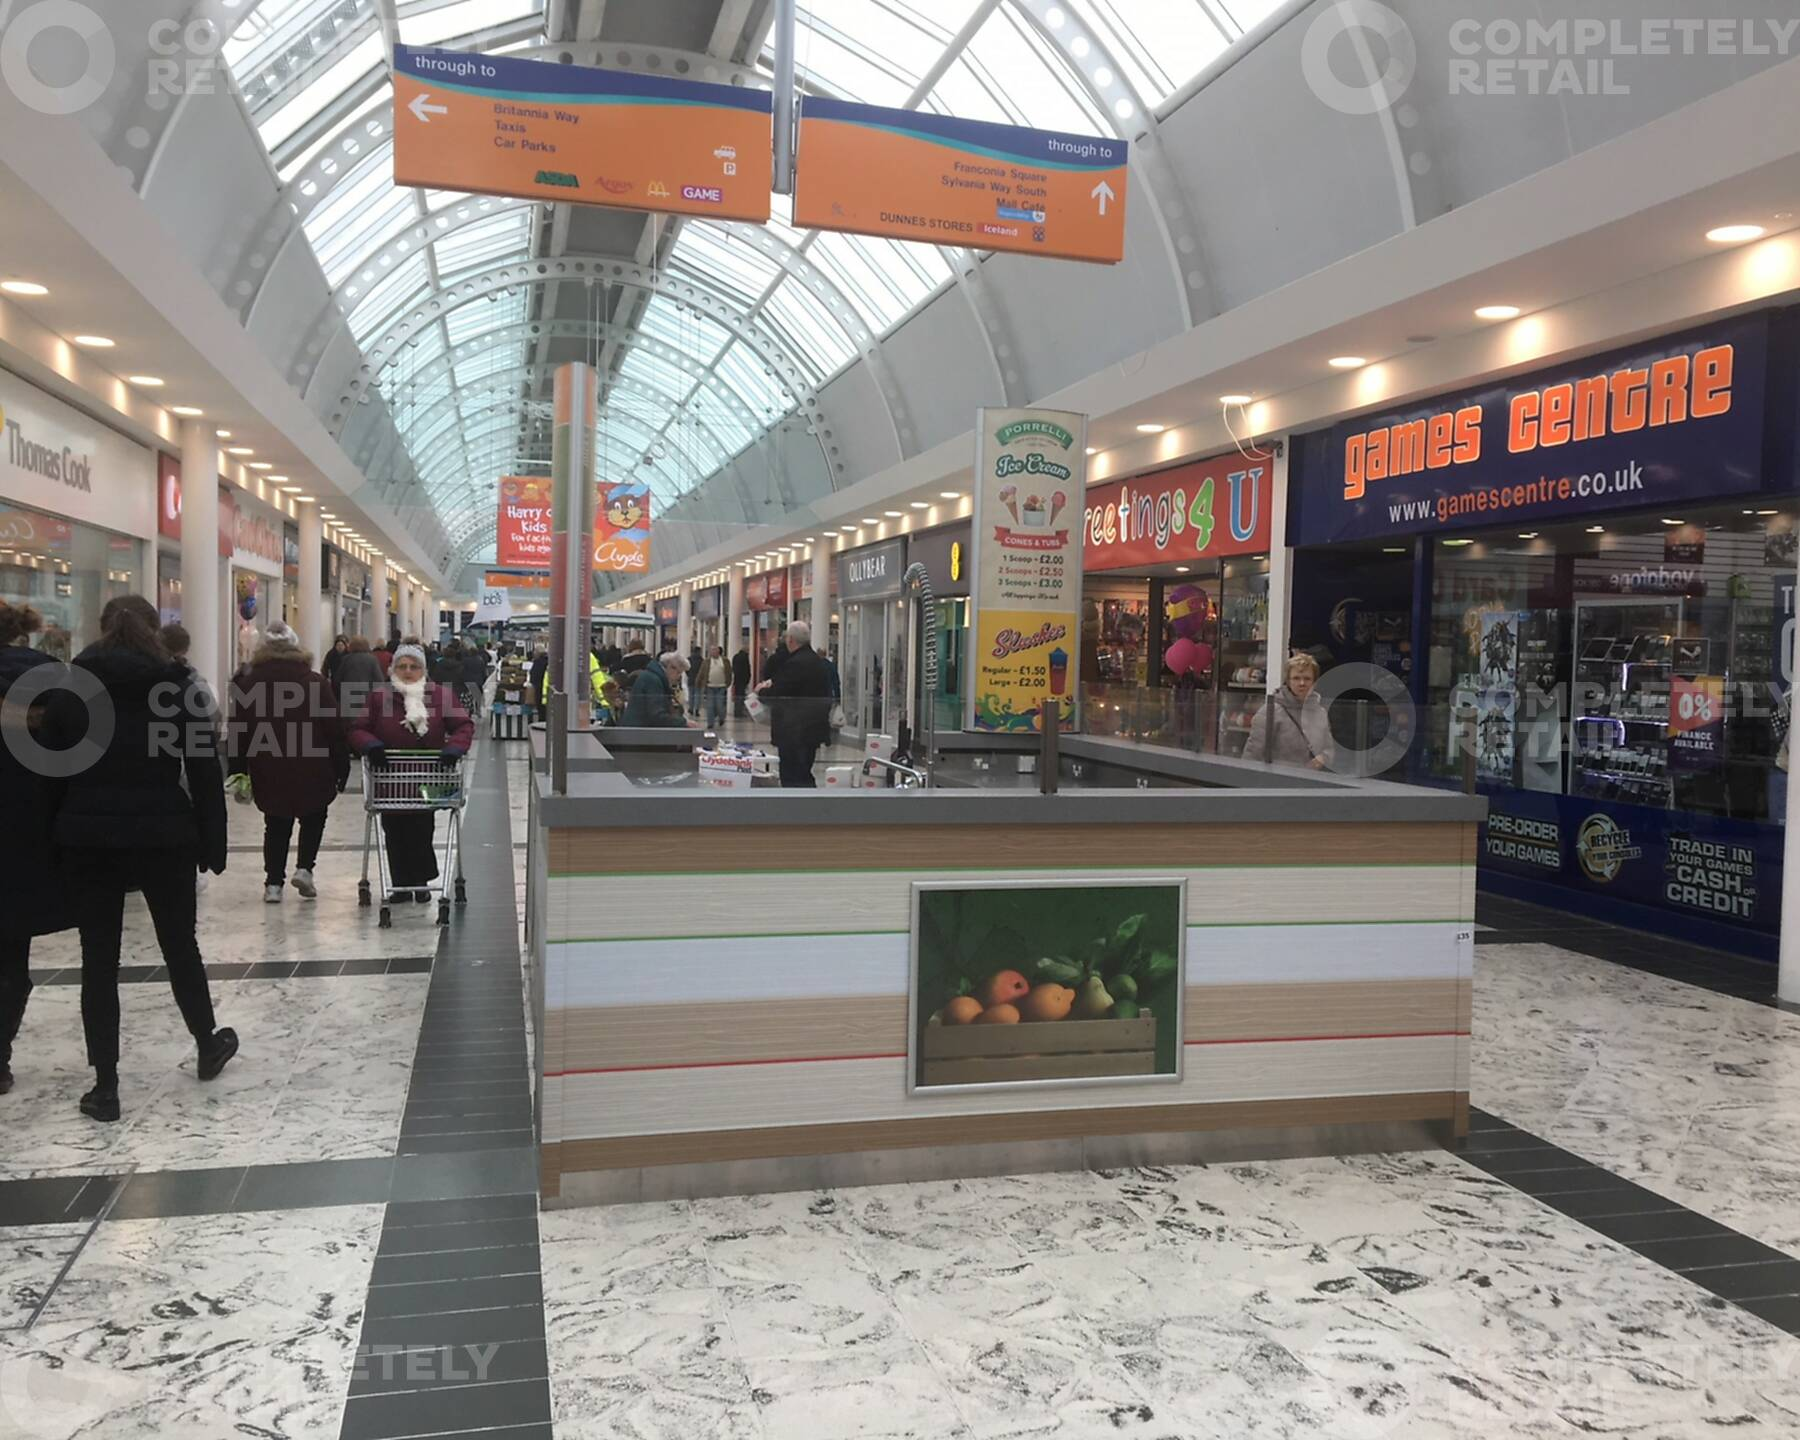 Invernia Square Kiosk